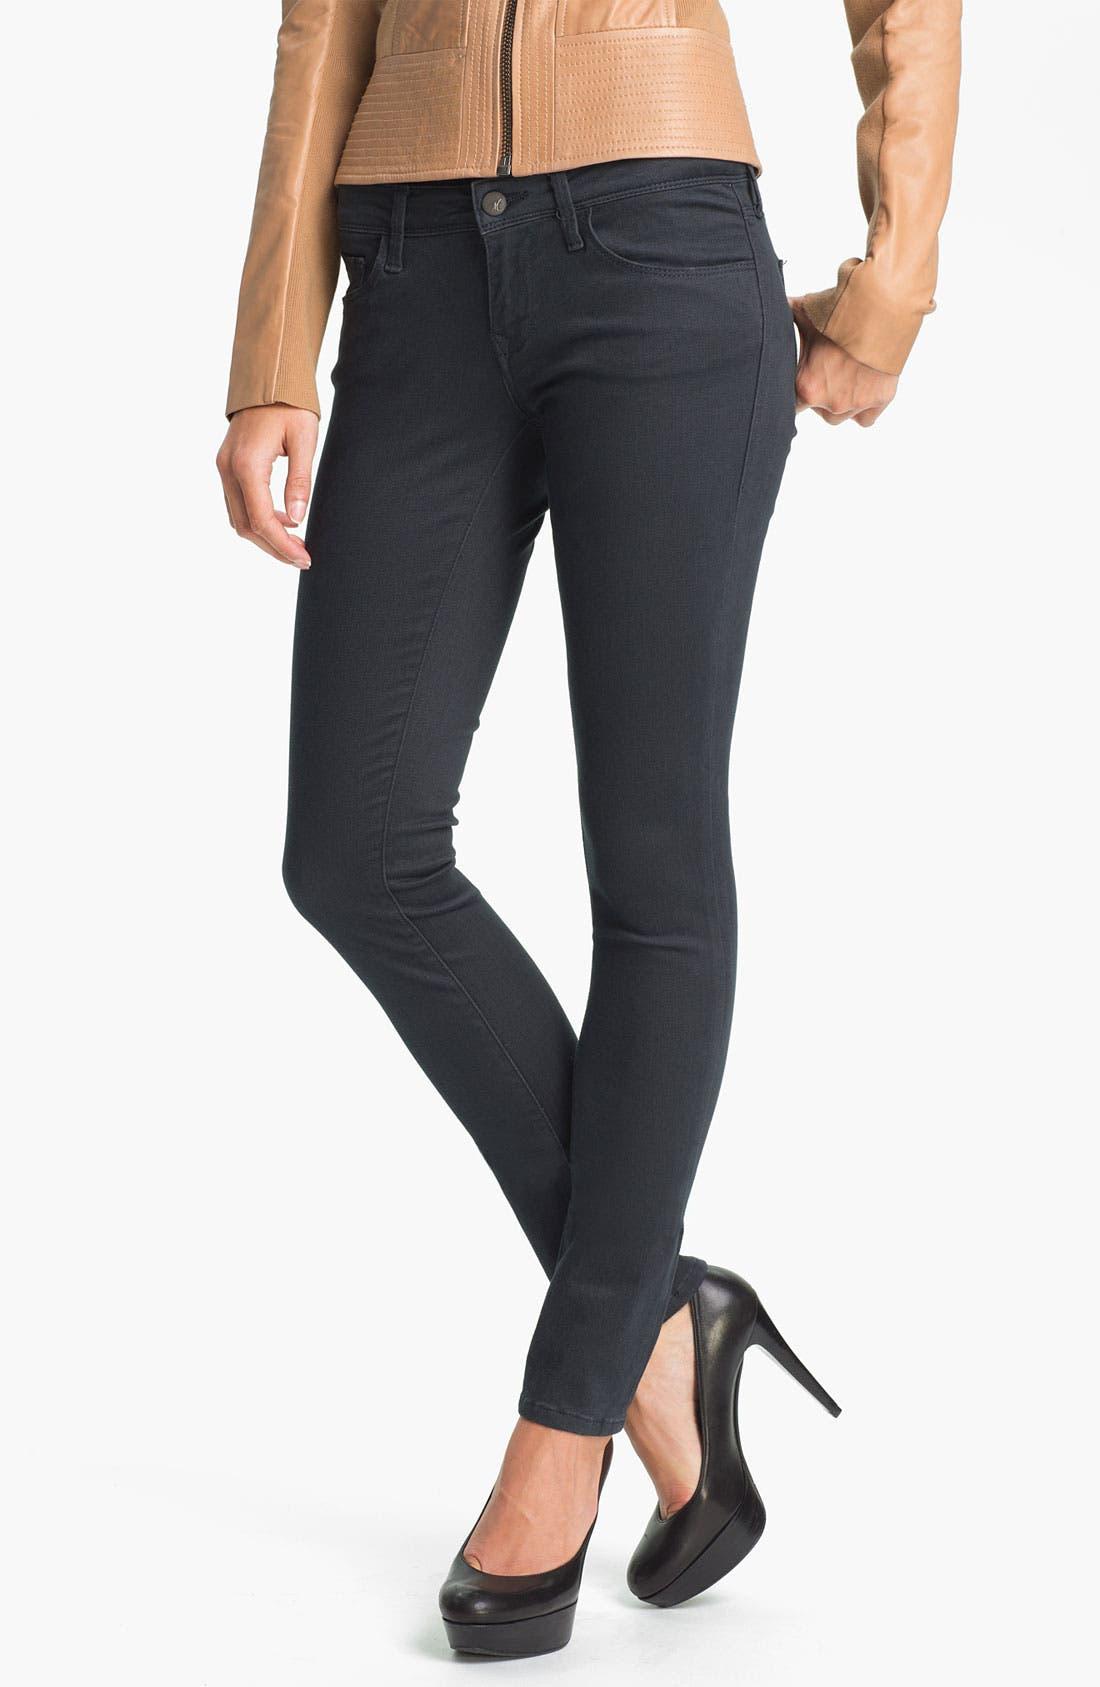 Alternate Image 1 Selected - Mavi Jeans 'Serena' Low Rise Skinny  Jeans (Sueded Granite) (Online Exclusive)